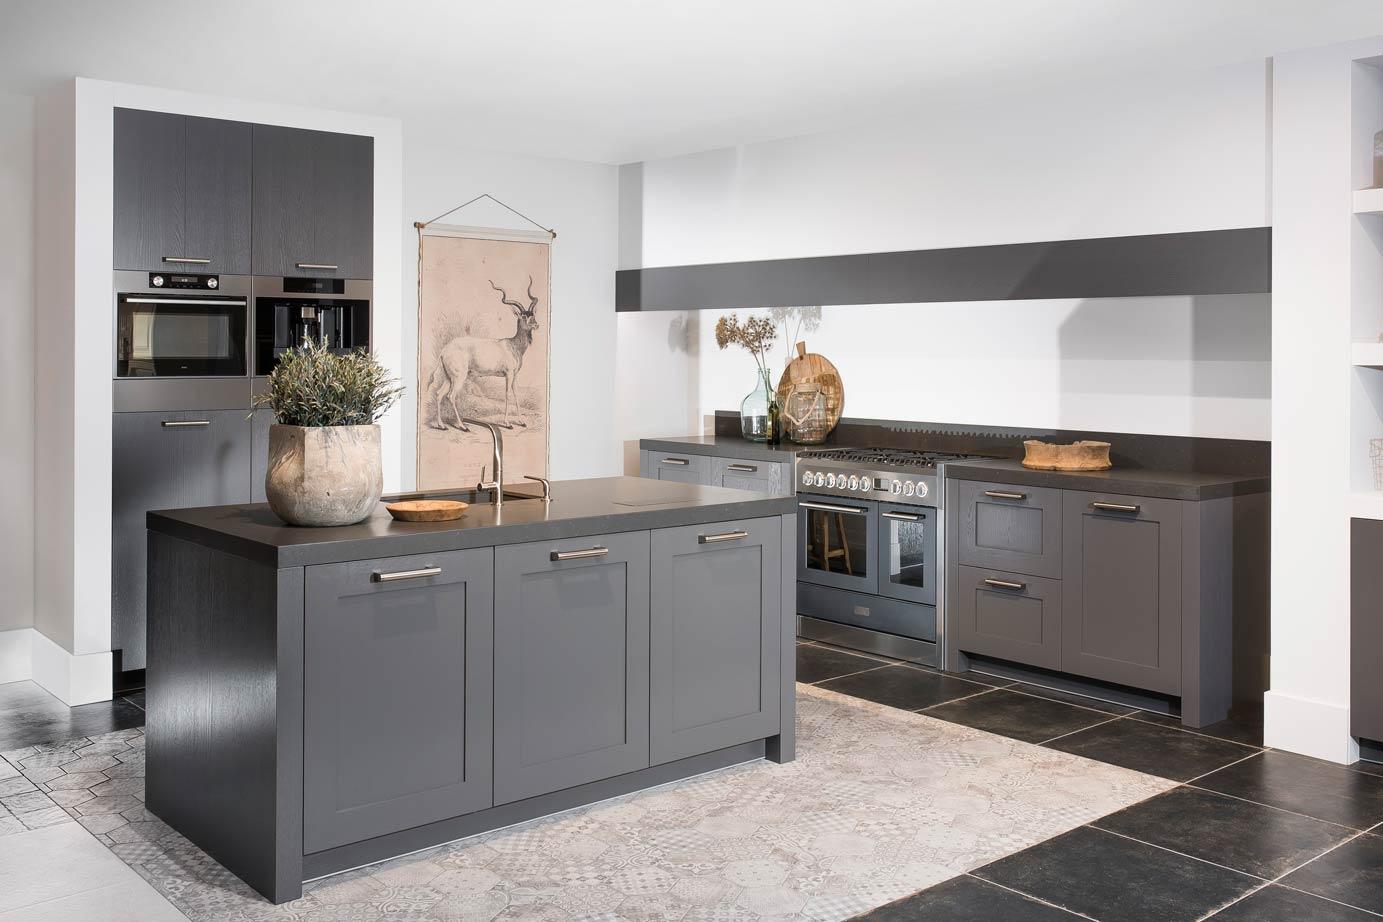 Beroemd Modern Landelijke keuken - DB Keukens &WP25